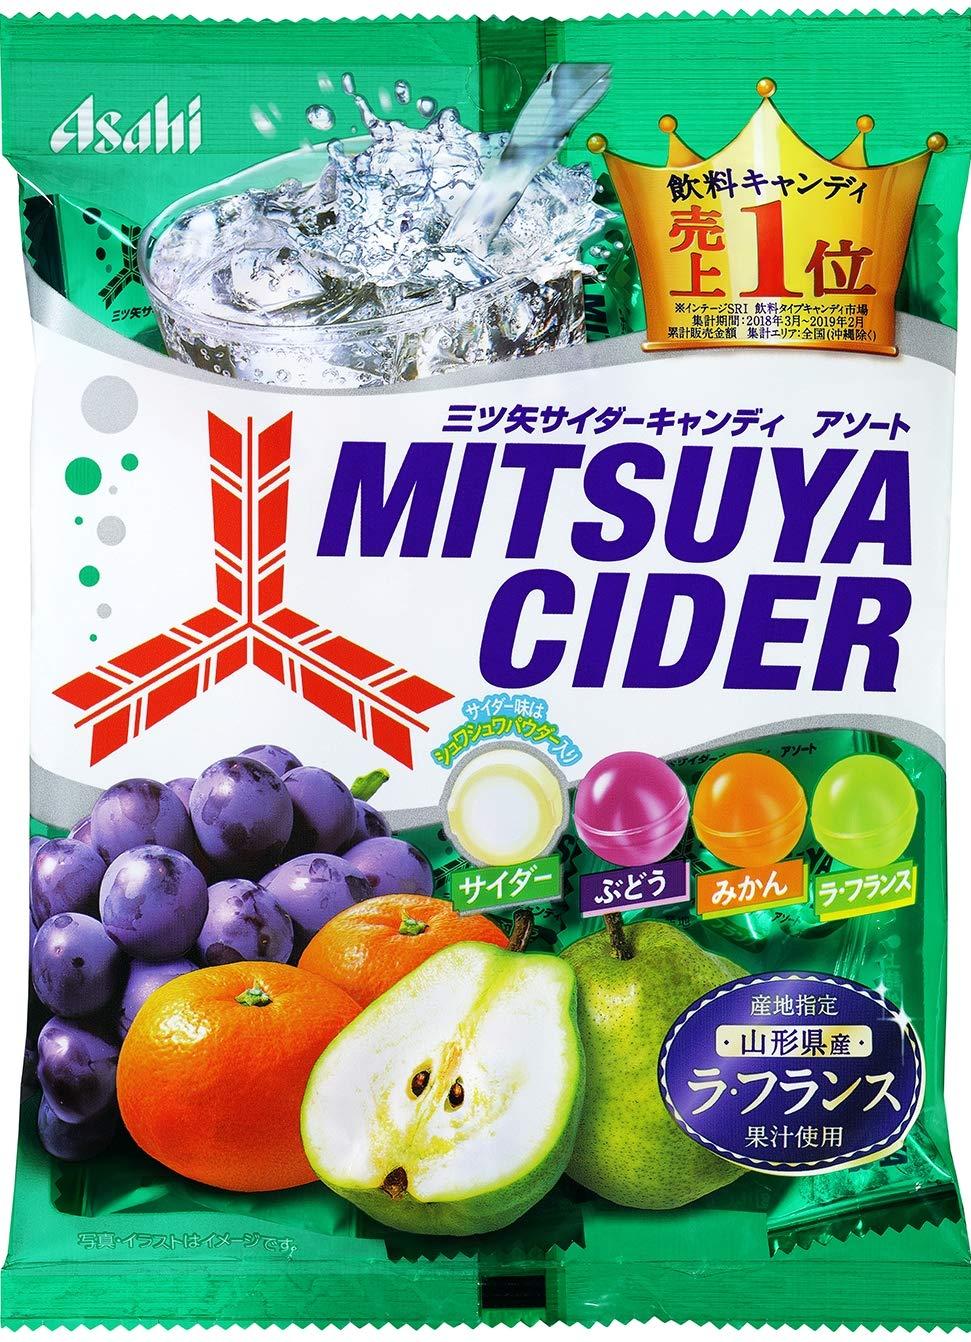 Asahi Food & amp; health care Mitsuya Cider Candy 136g ~ 6 bags